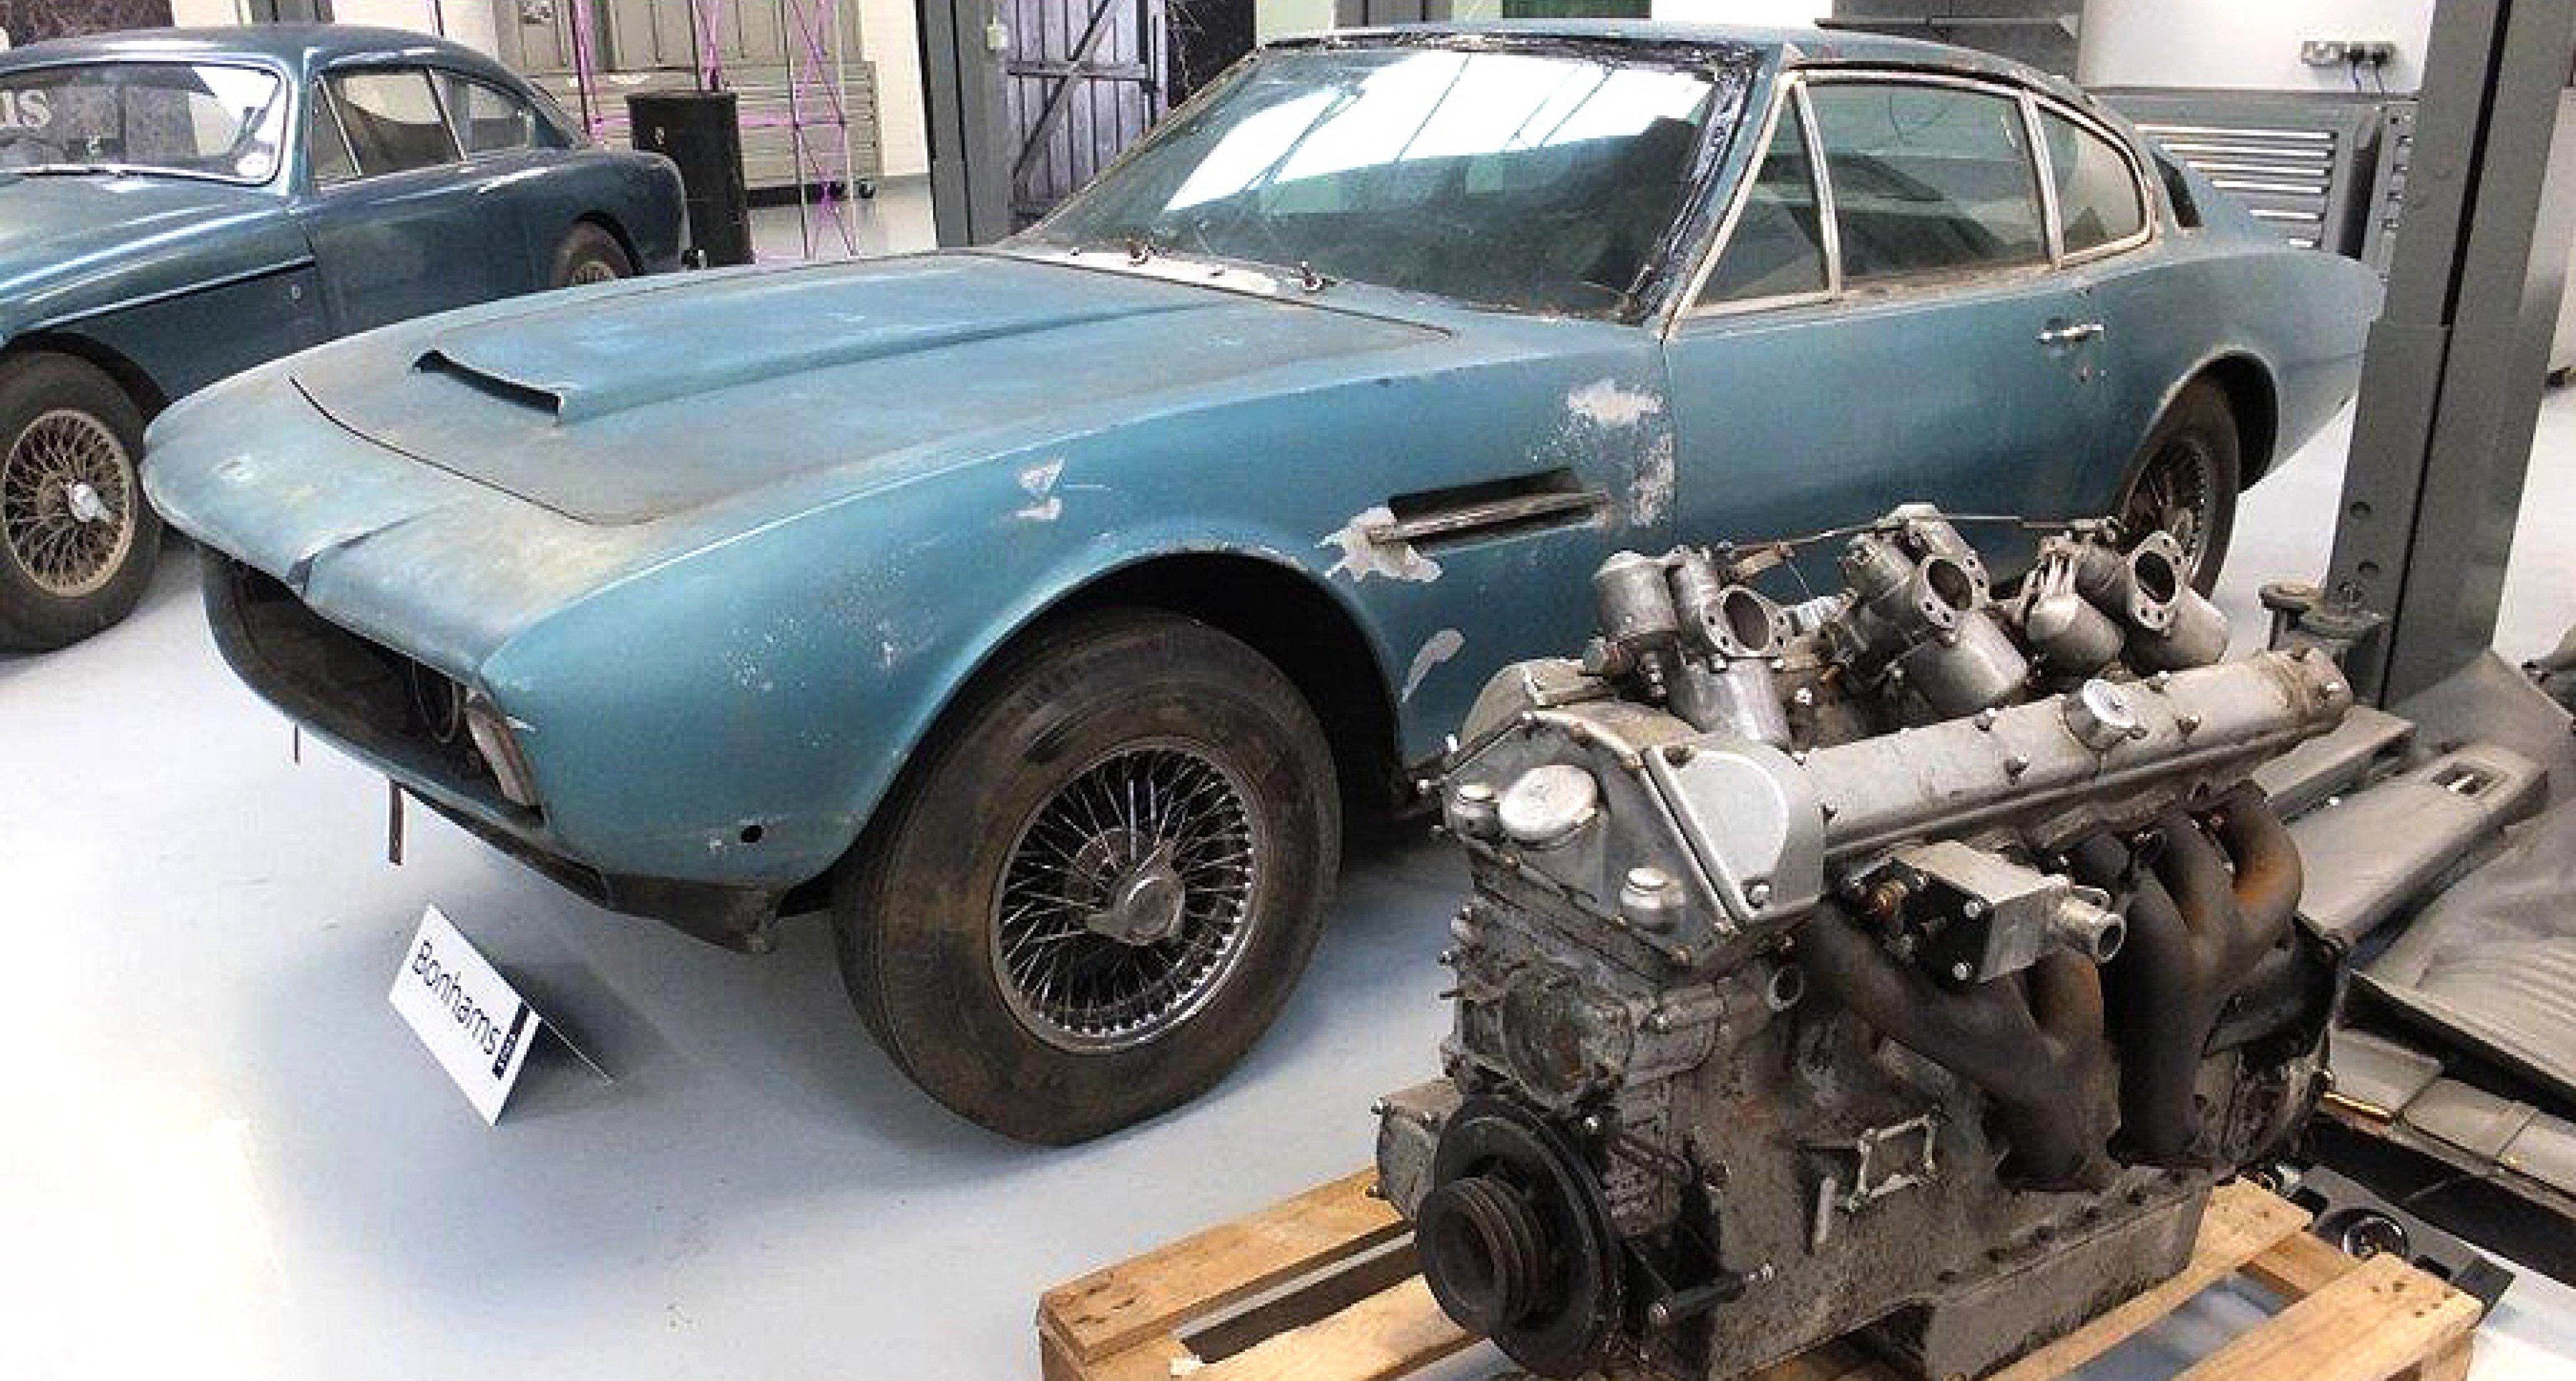 Barnfinds Return Home Bonhams Aston Martin Sale At Newport - Aston martin restoration project for sale